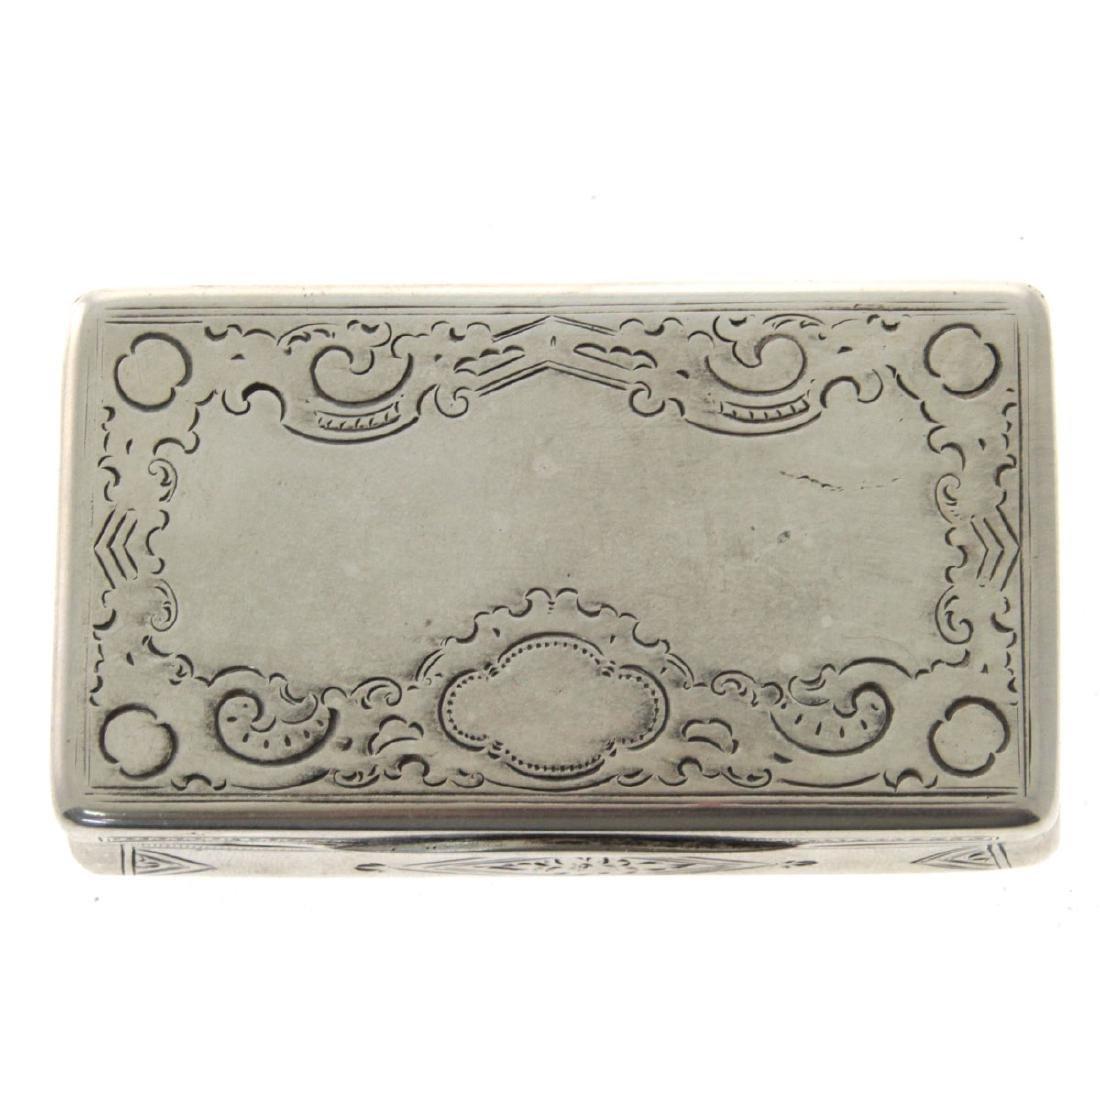 Antique Silver Snuff Box, Vienna, Austria, 1868. - 2